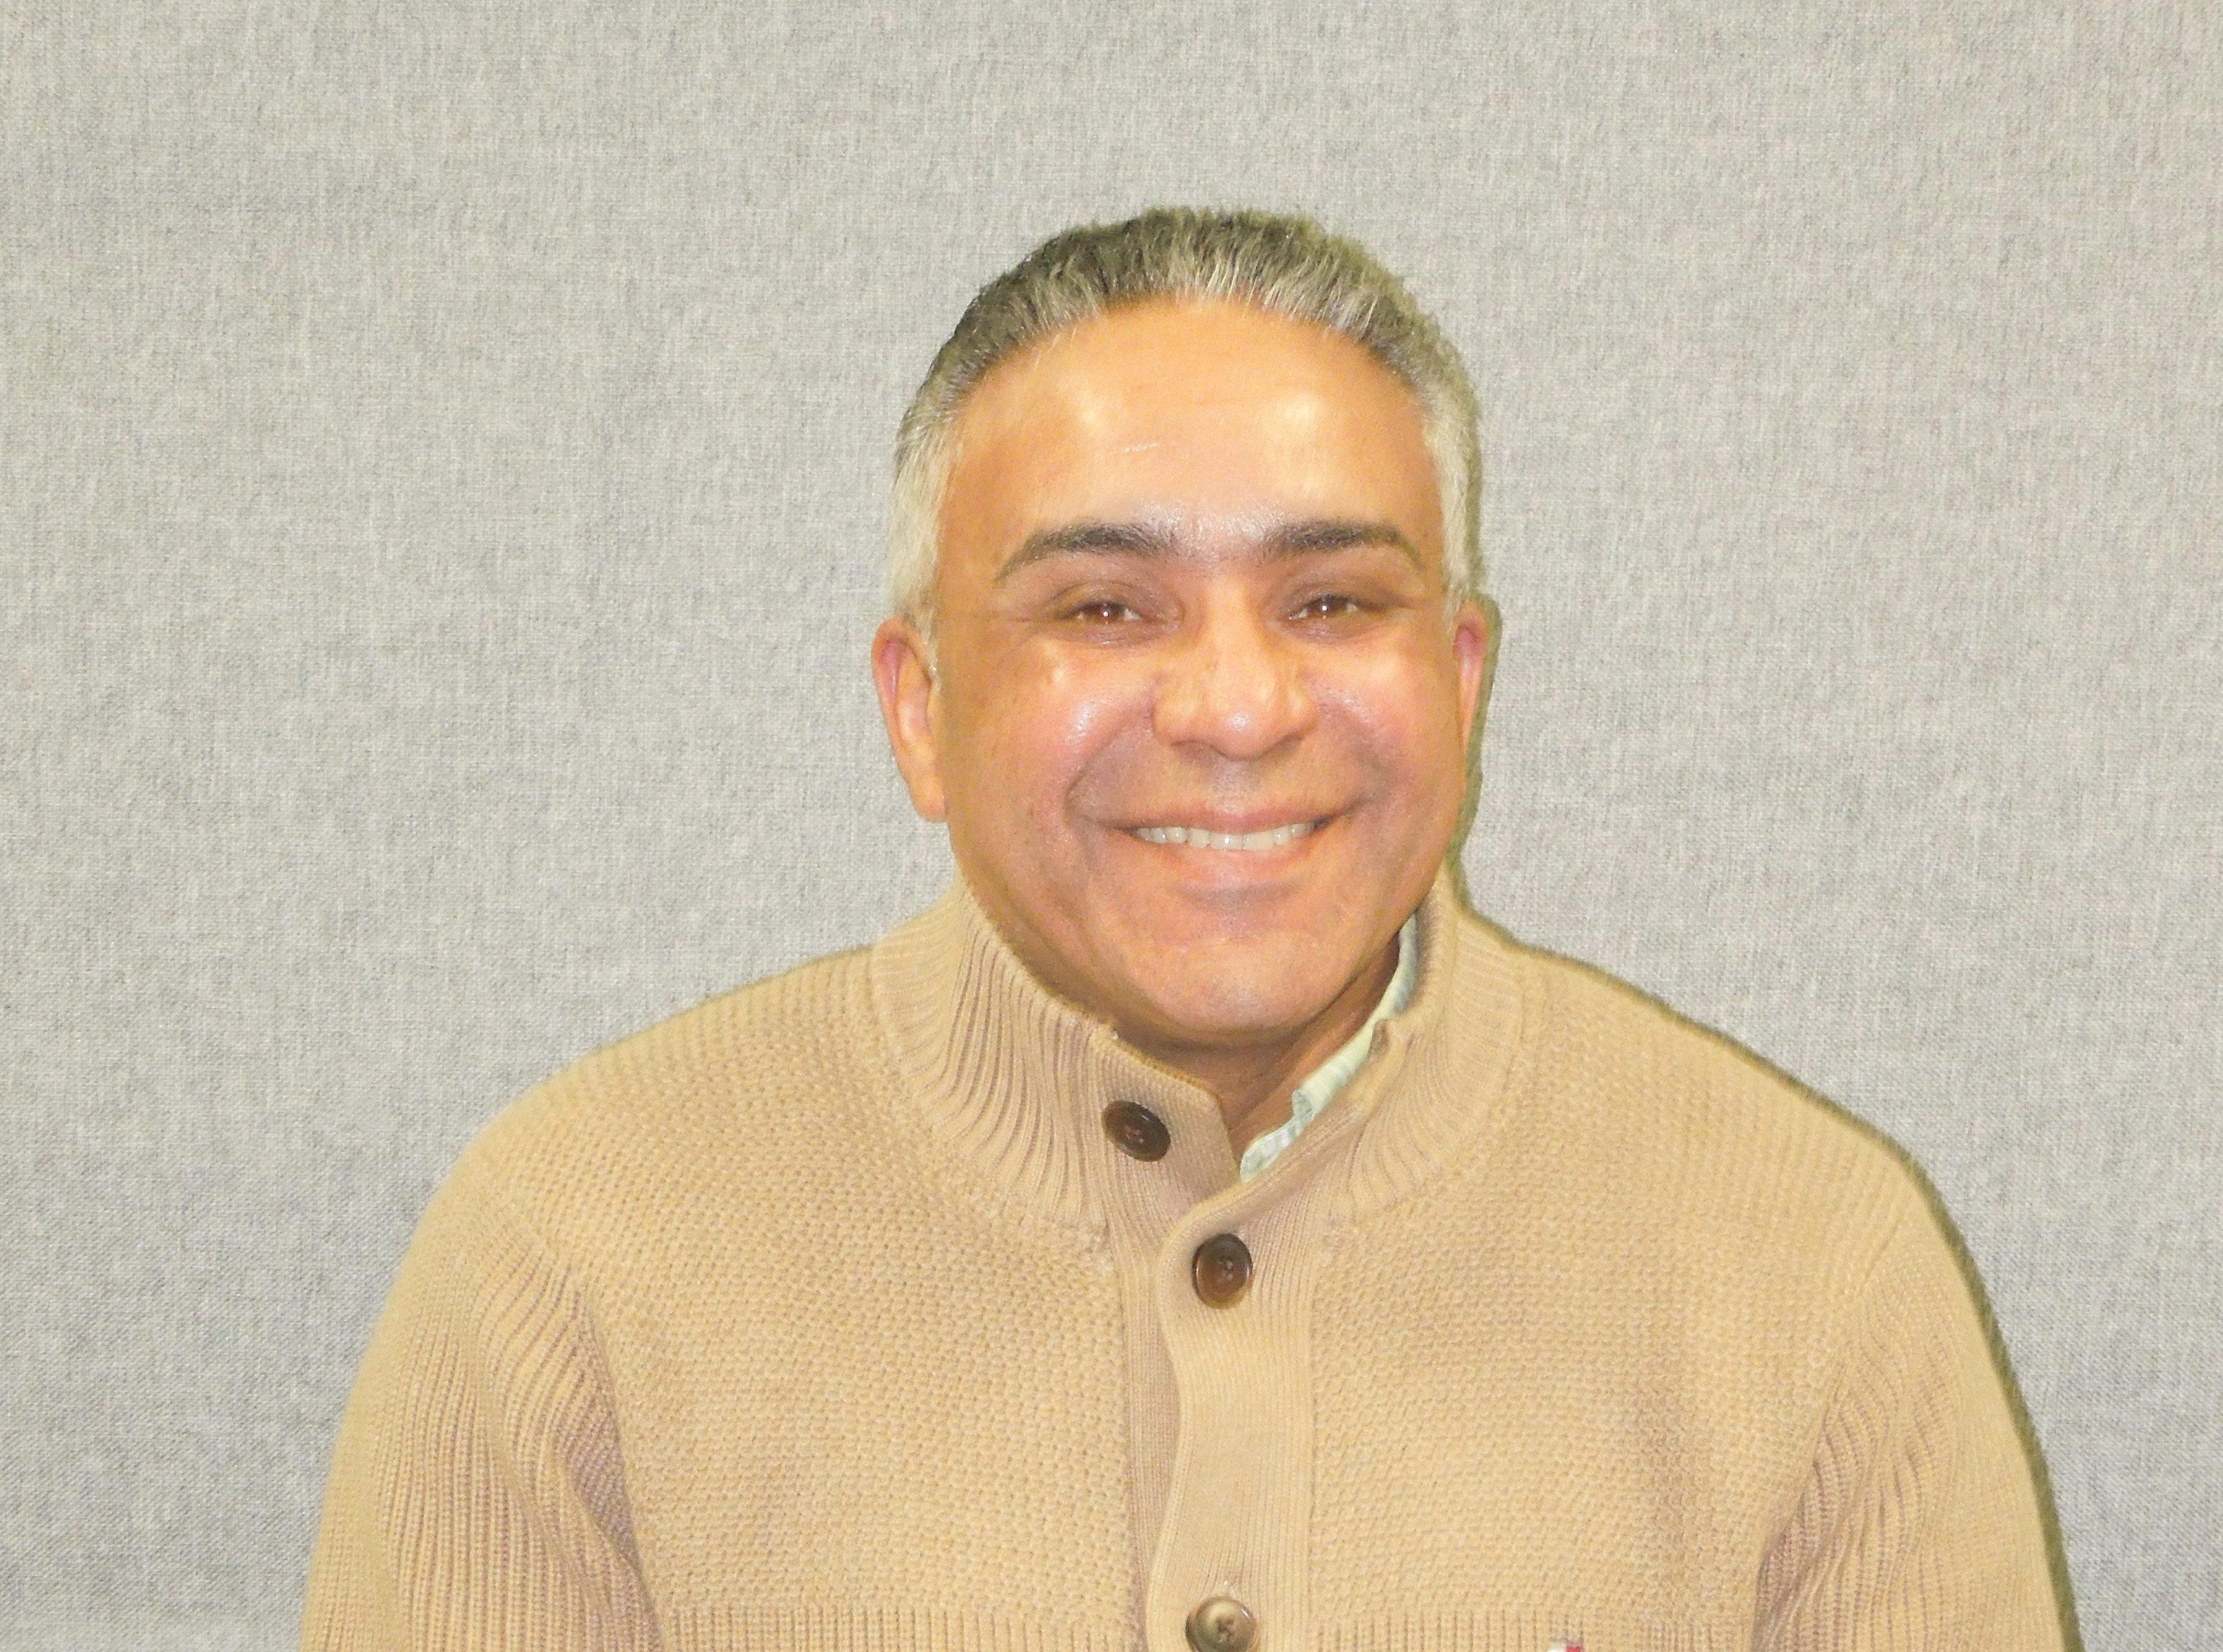 Victor Rodriguez Habilitation Specialist